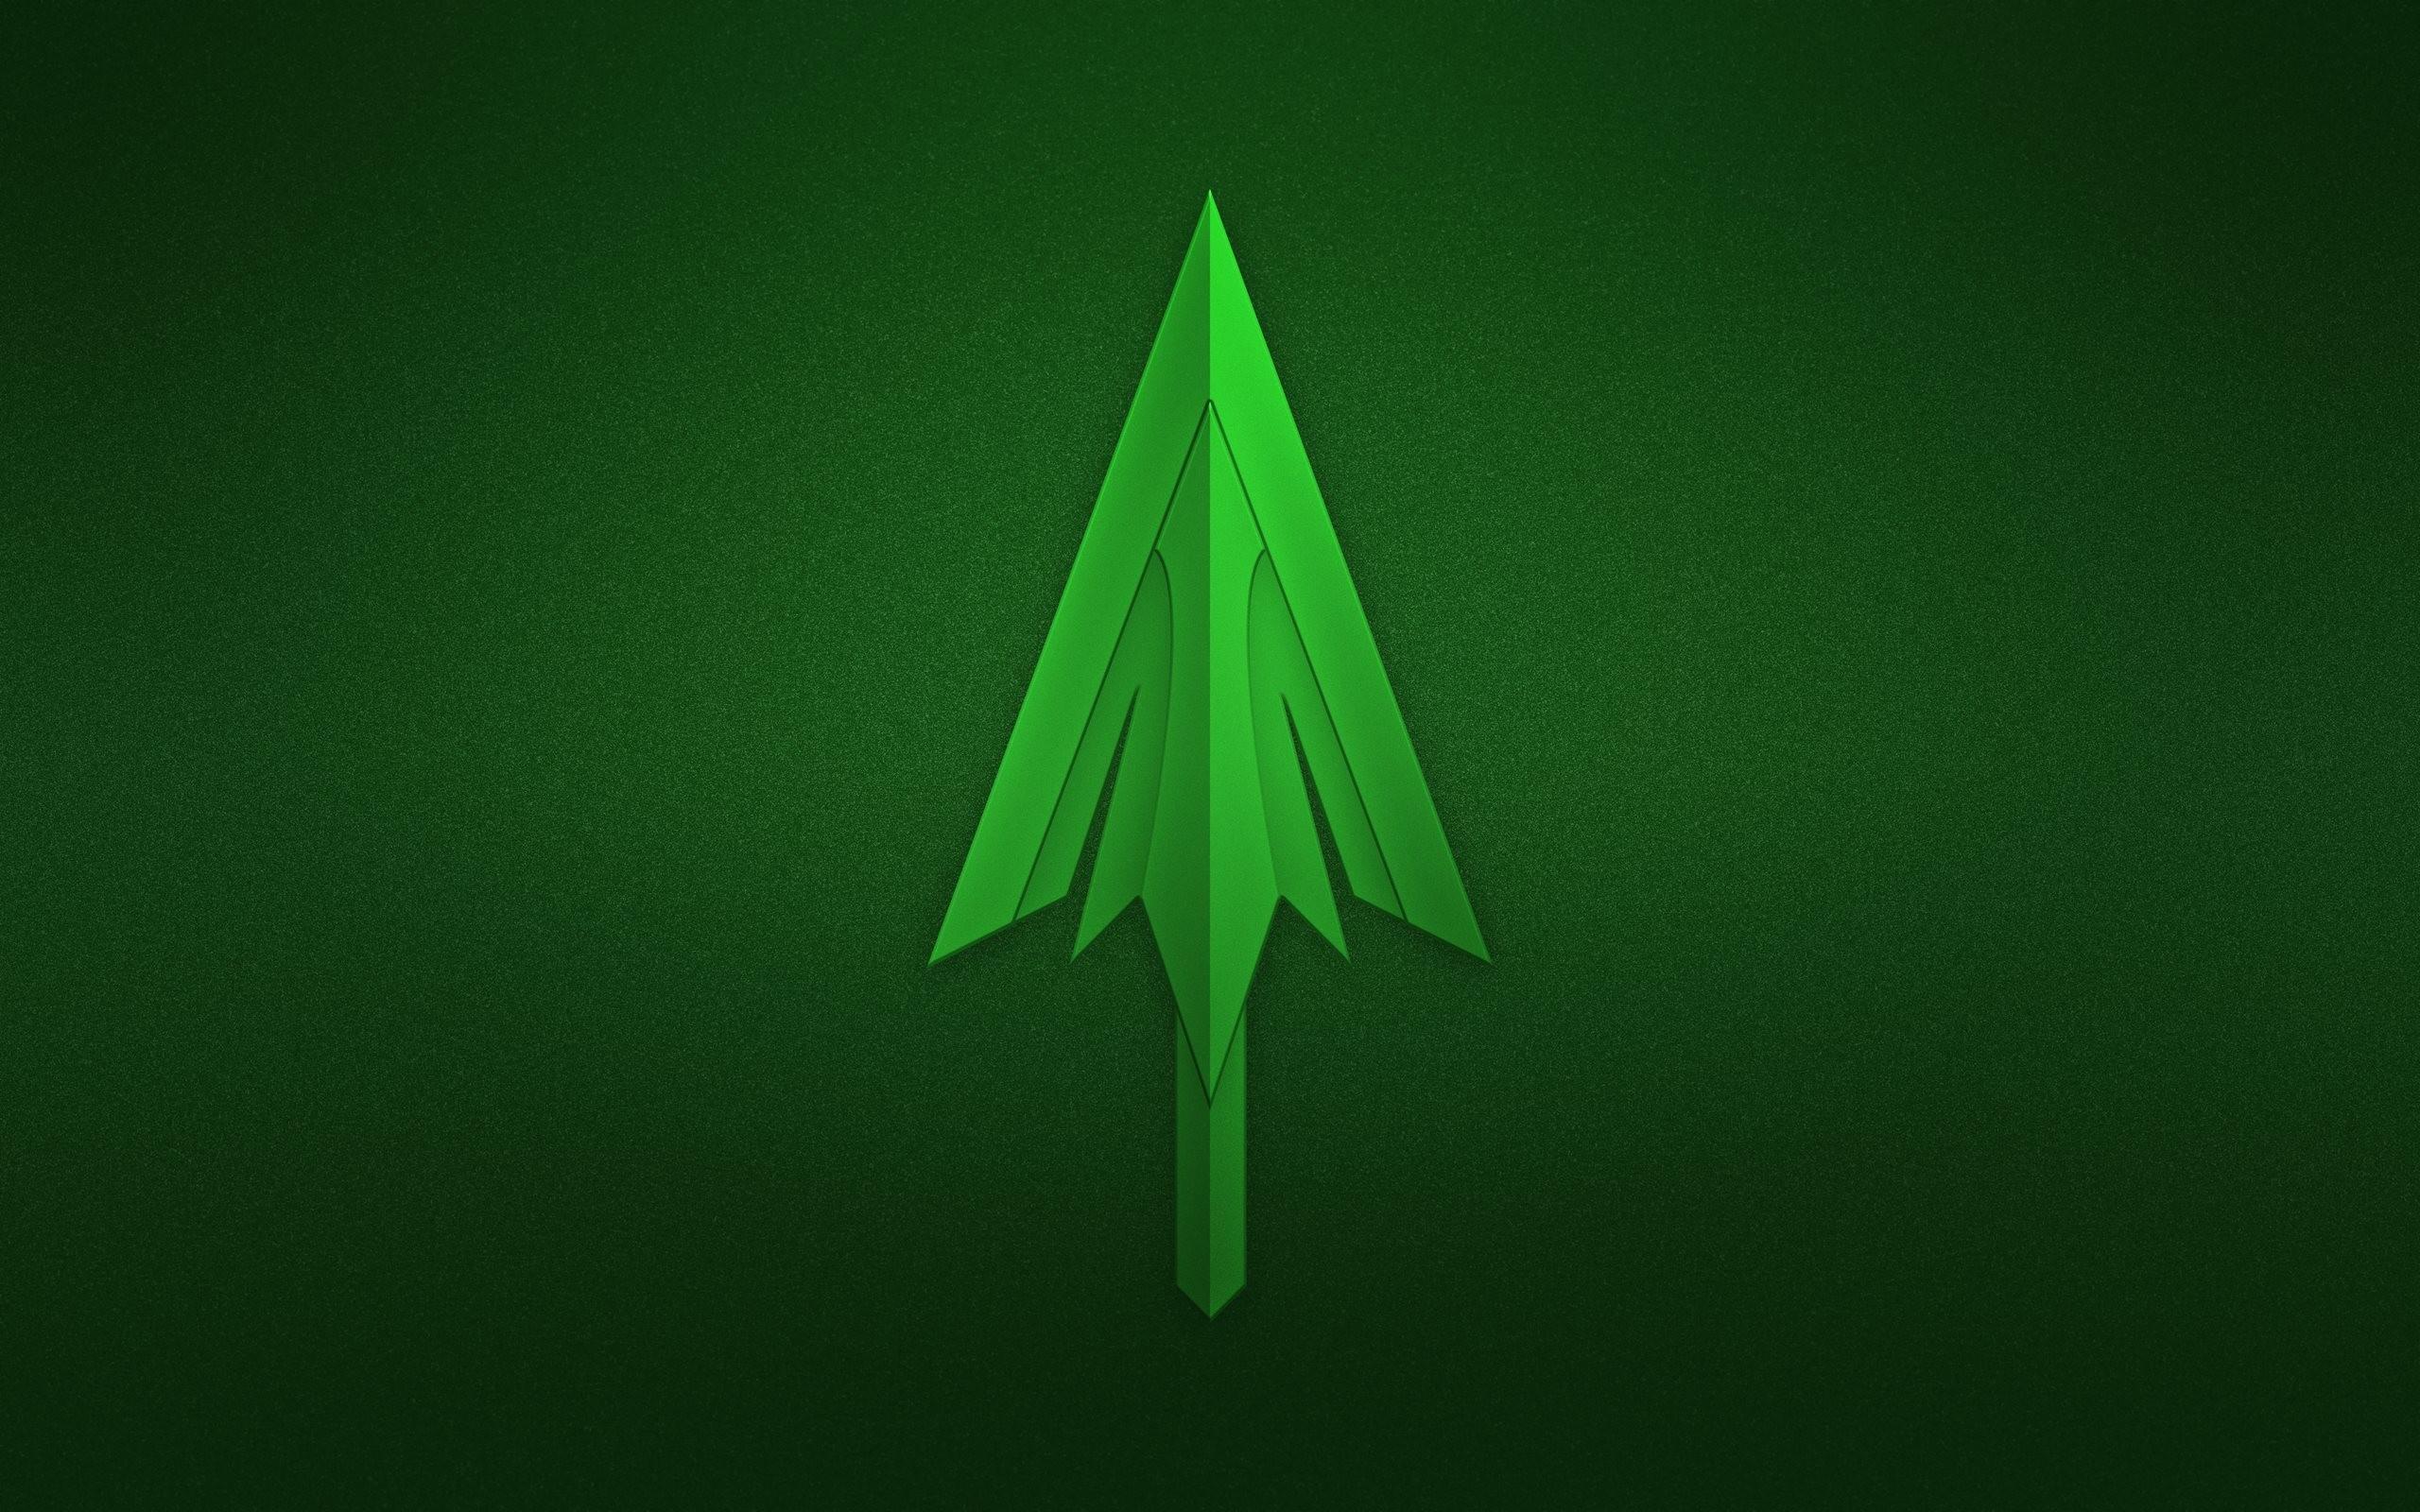 HD Wallpaper: Green Arrow